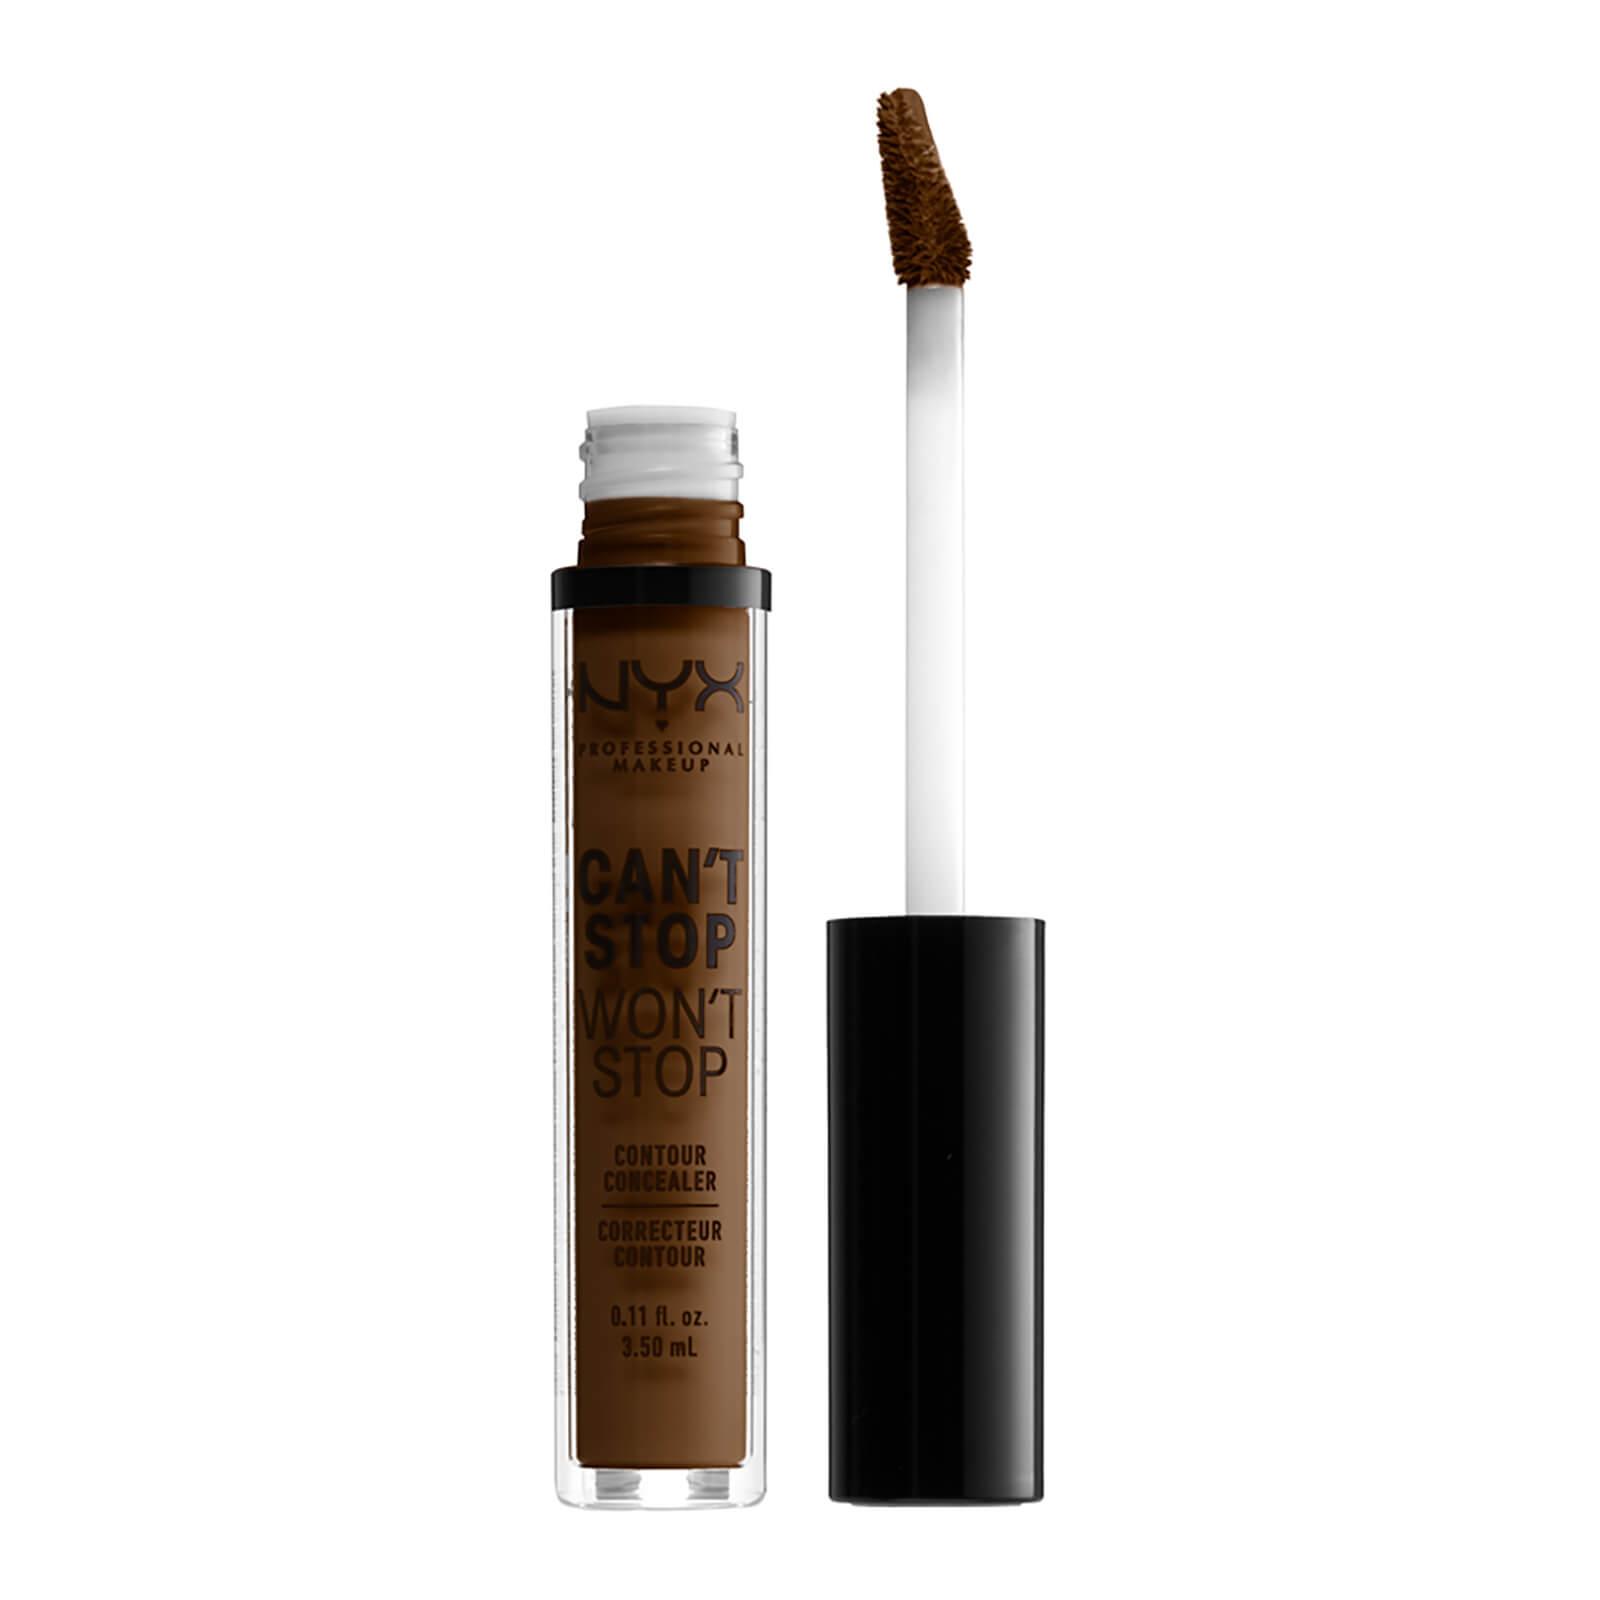 nyx professional makeup can't stop won't stop contour concealer (various shades) - walnut